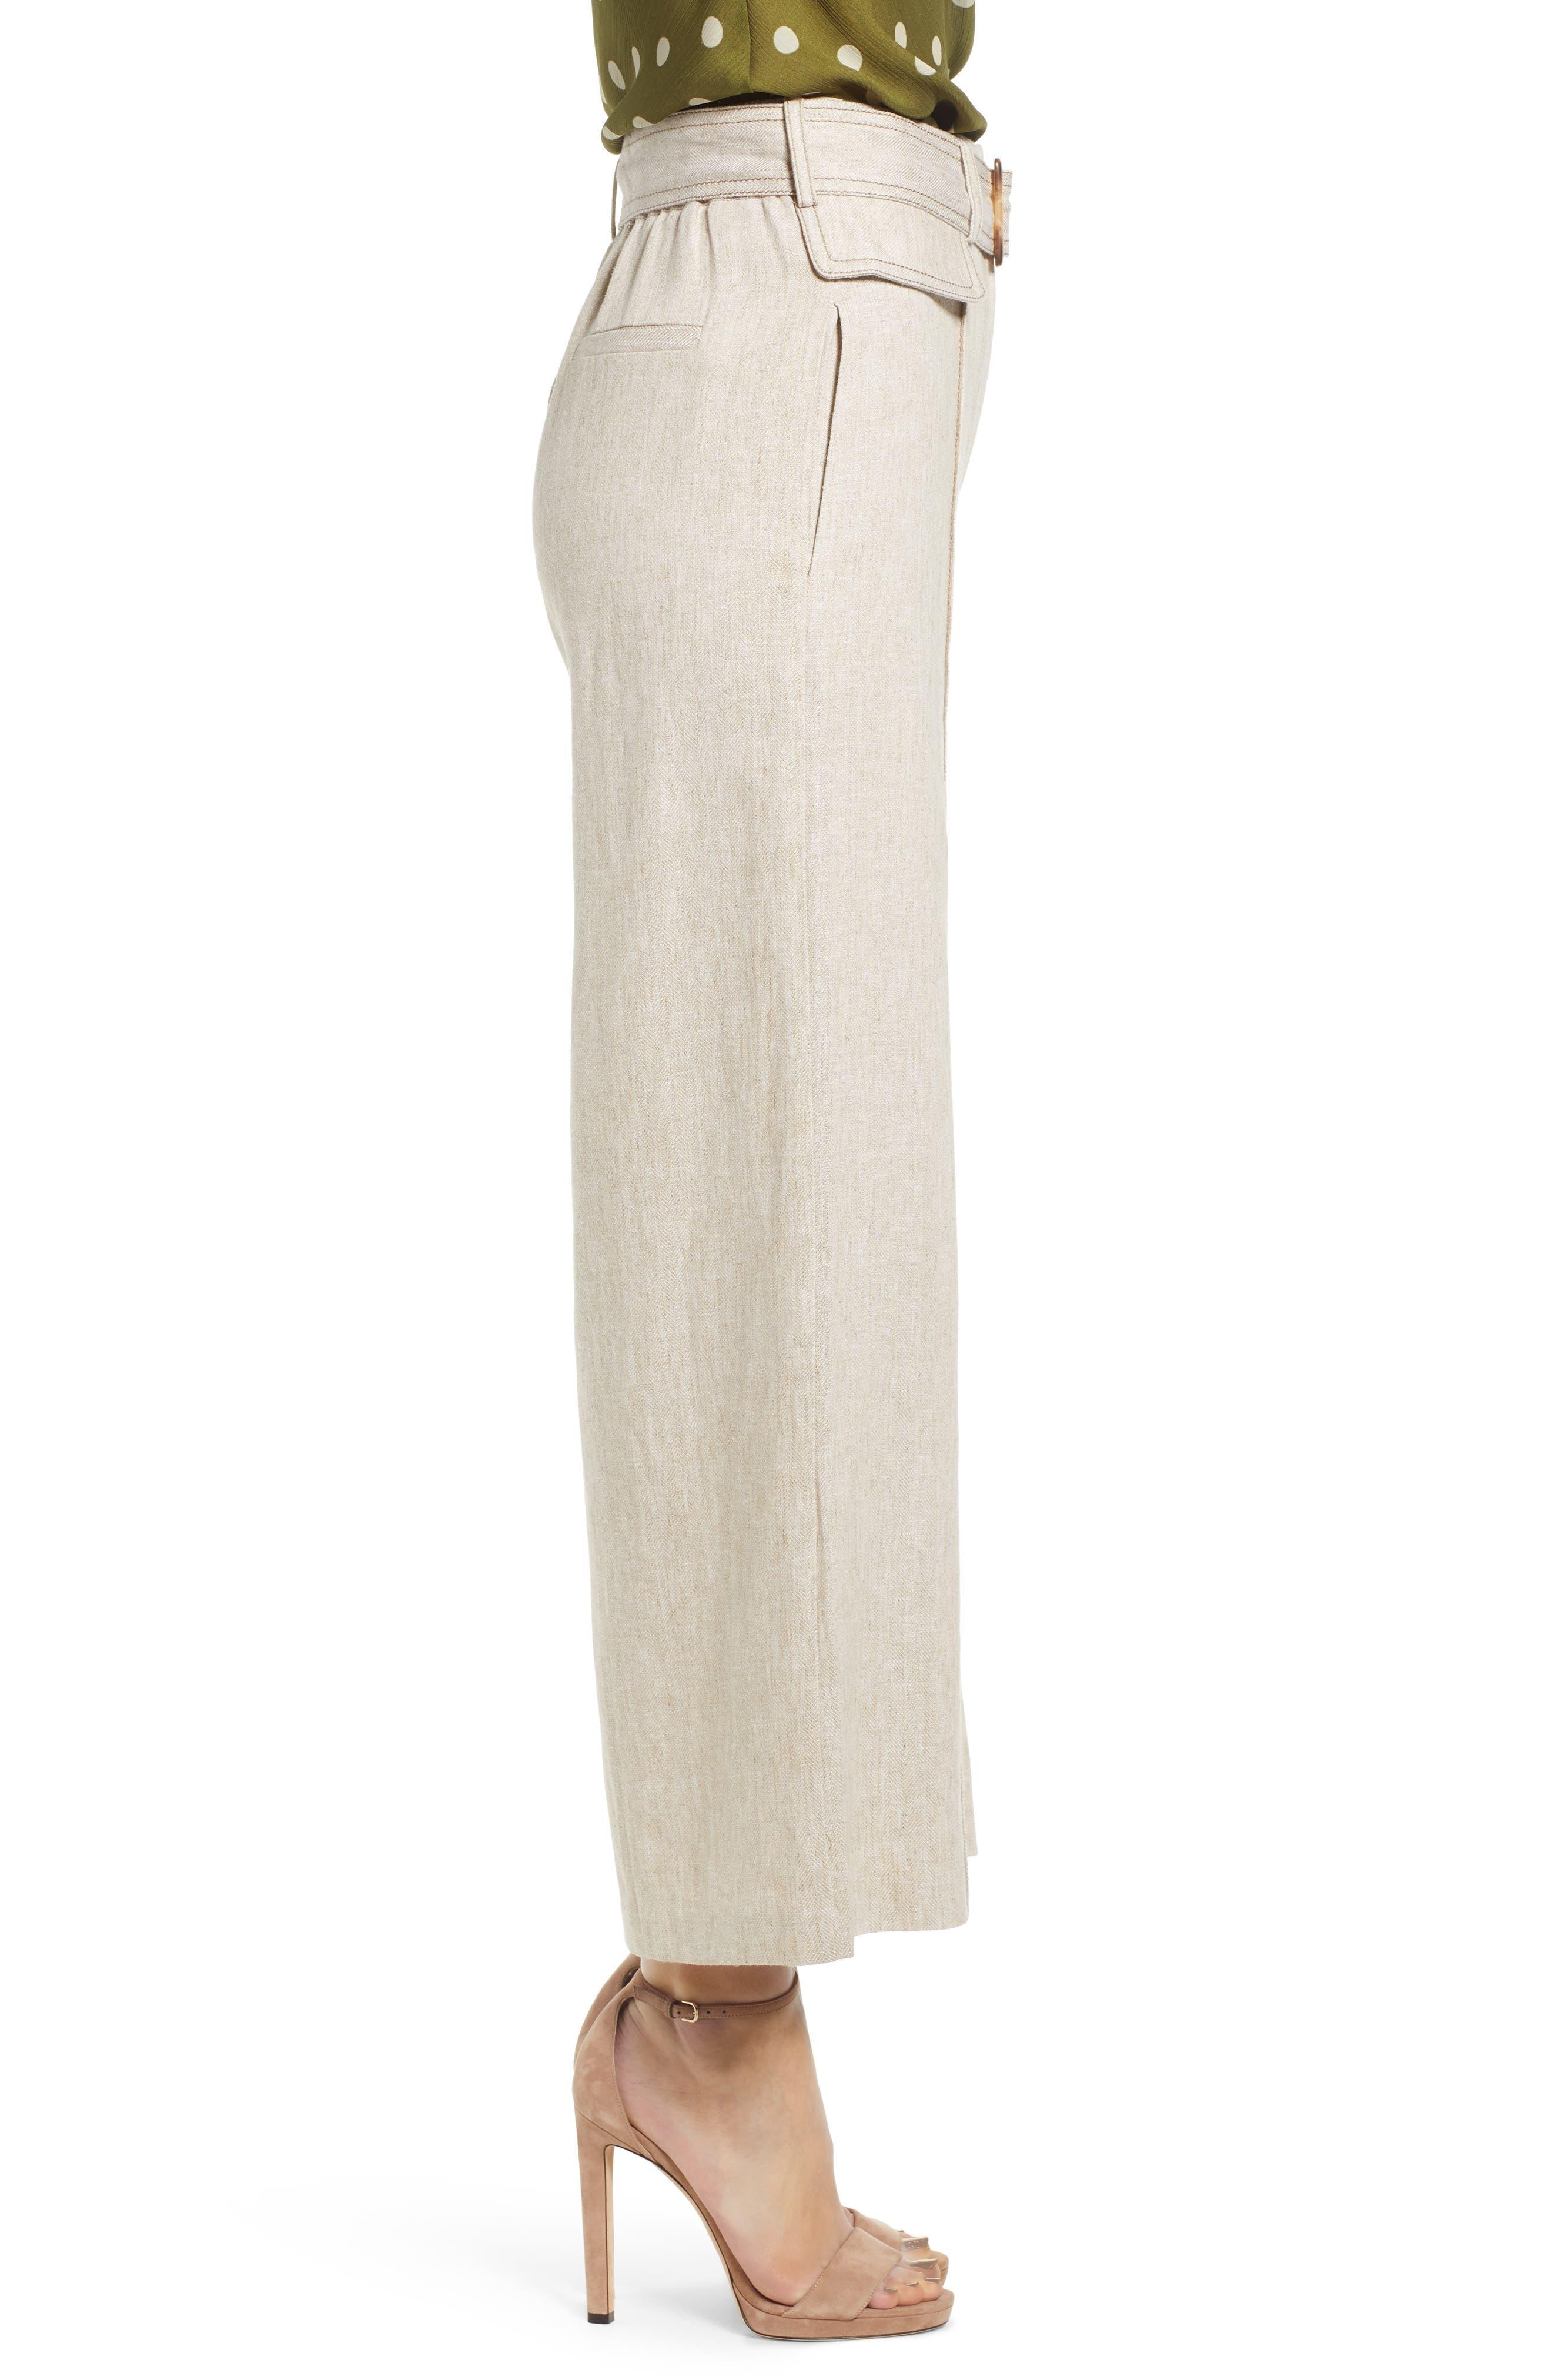 CHRISELLE LIM COLLECTION, Chriselle Lim Toulouse Wide Leg Crop Trousers, Alternate thumbnail 4, color, OATMEAL